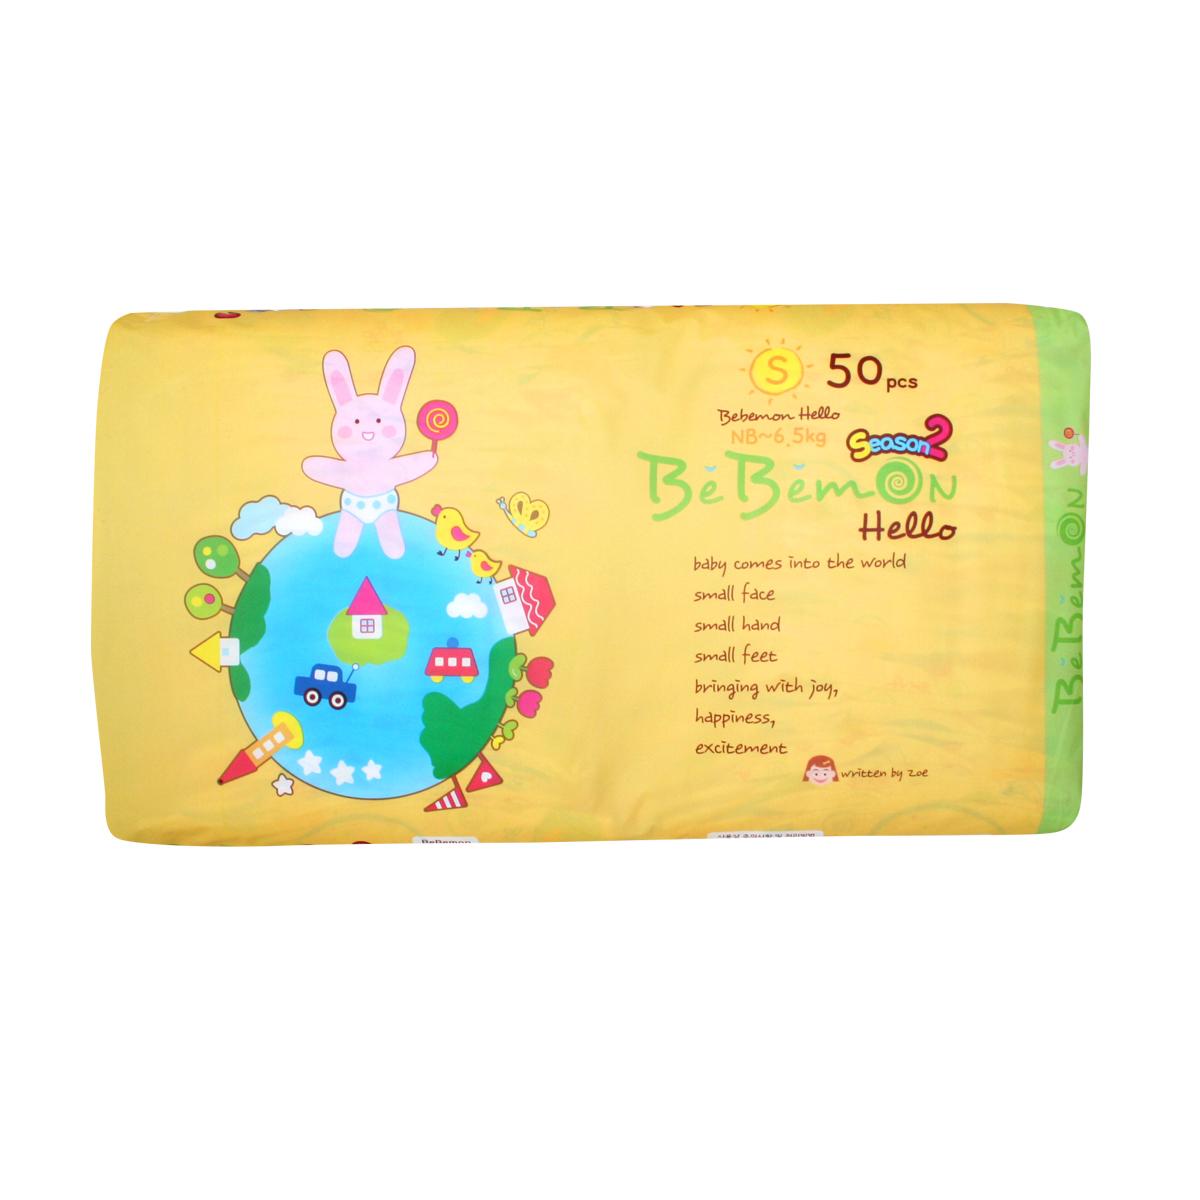 BebemonПодгузники детские Band 0-6 кг размер S 50 шт Younglim B&A Co., Ltd